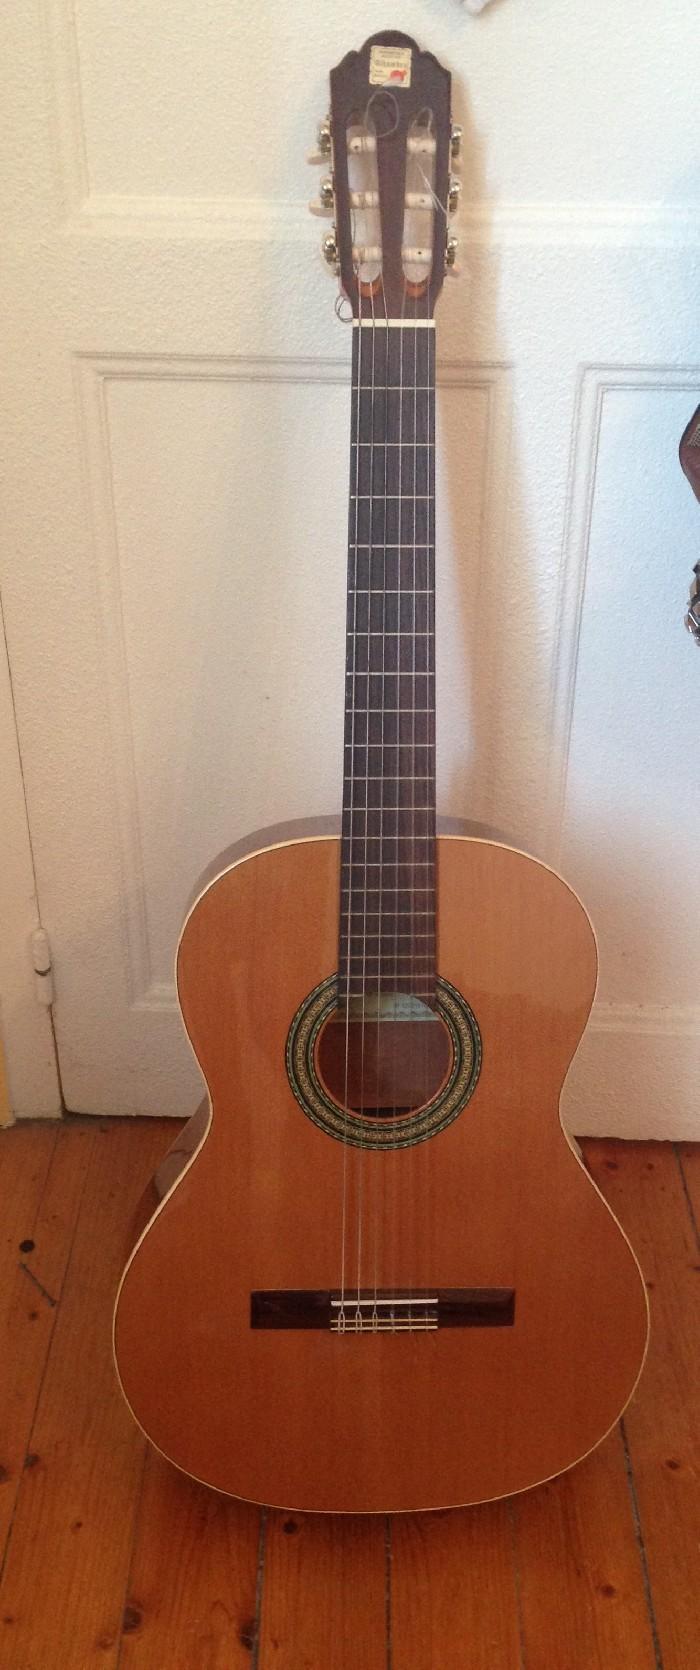 guitare classique alhambra vendre. Black Bedroom Furniture Sets. Home Design Ideas